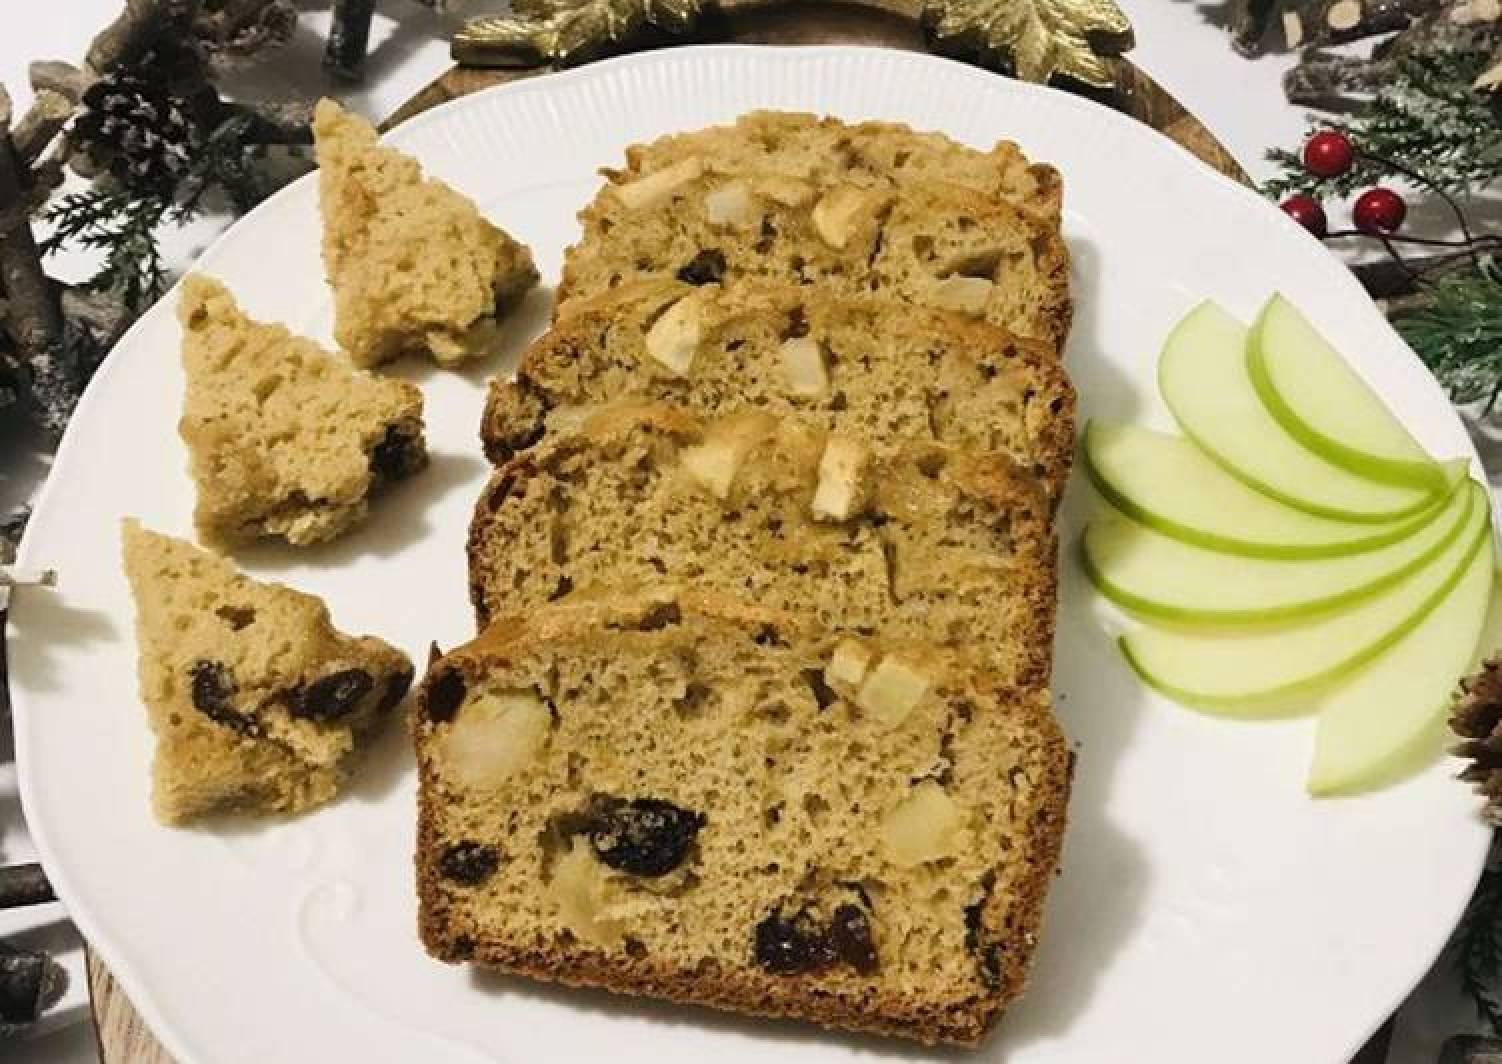 Apple cinnamon & cranberry Loaf cake #onerecipeonetree🌲